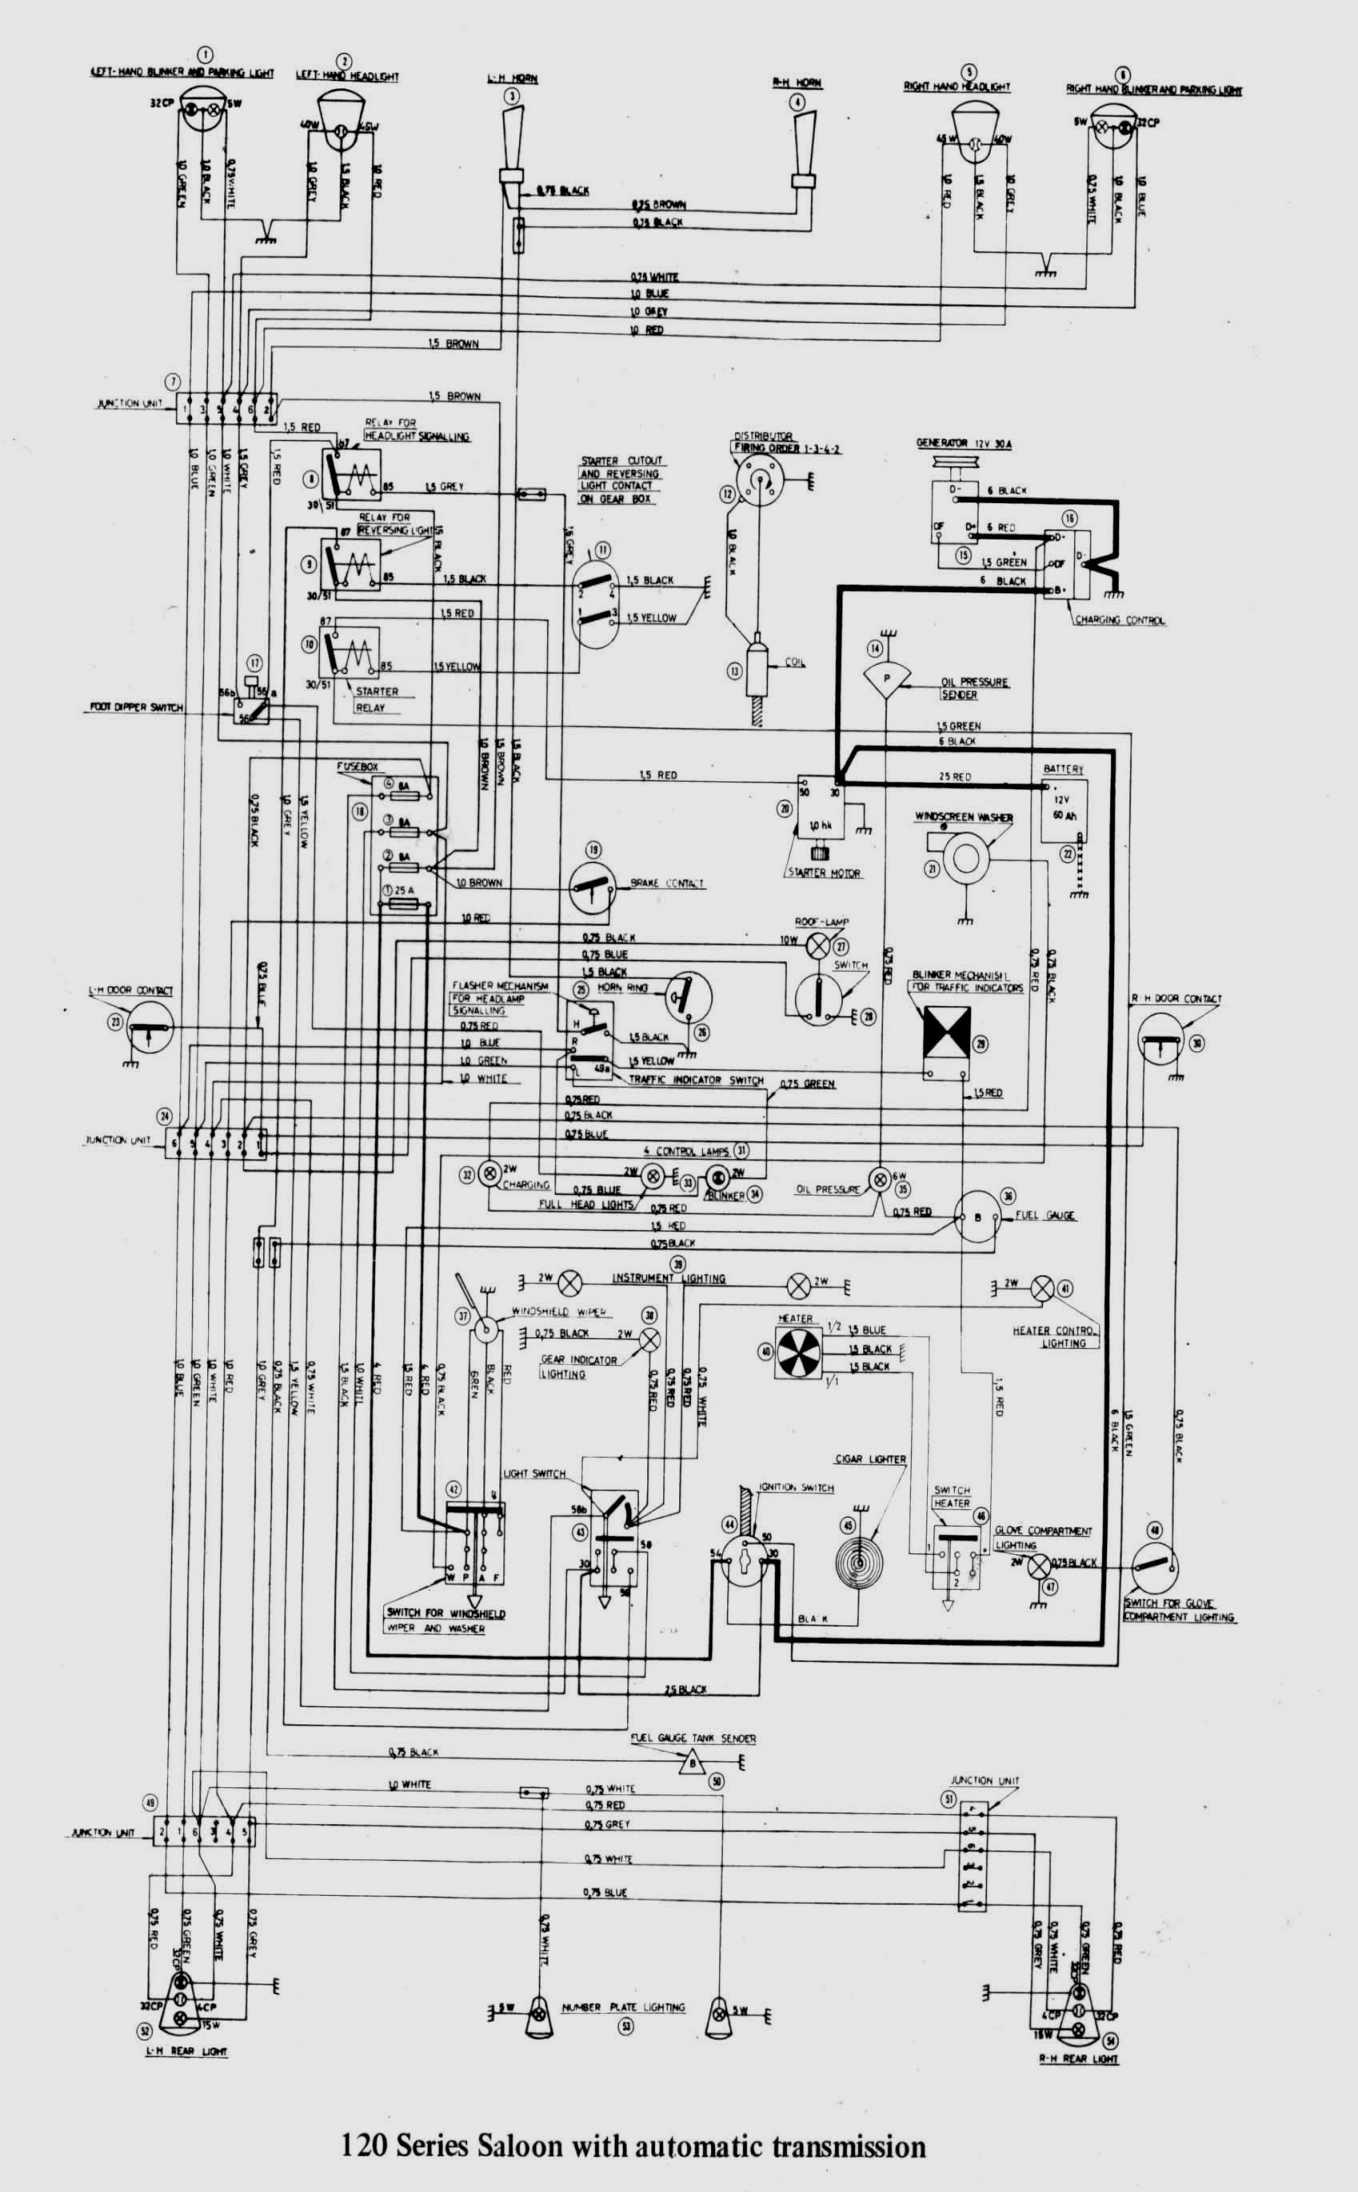 volvo truck wg64t wiring diagrams - wiring diagrams button drop-blast -  drop-blast.lamorciola.it  drop-blast.lamorciola.it